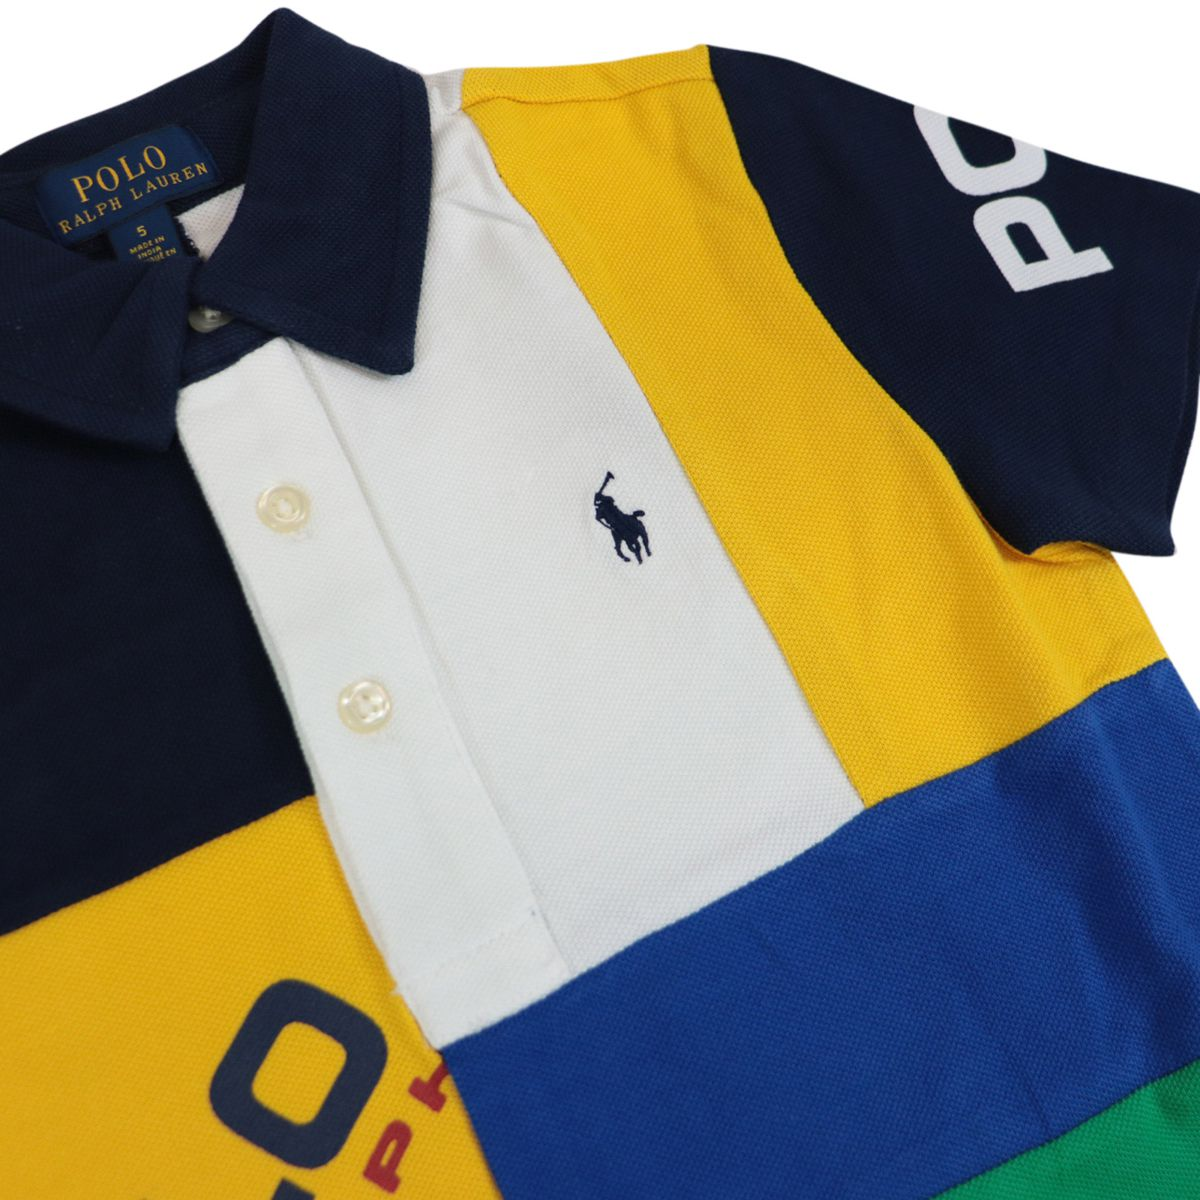 Multicolor three-button polo shirt with logo print White Polo Ralph Lauren